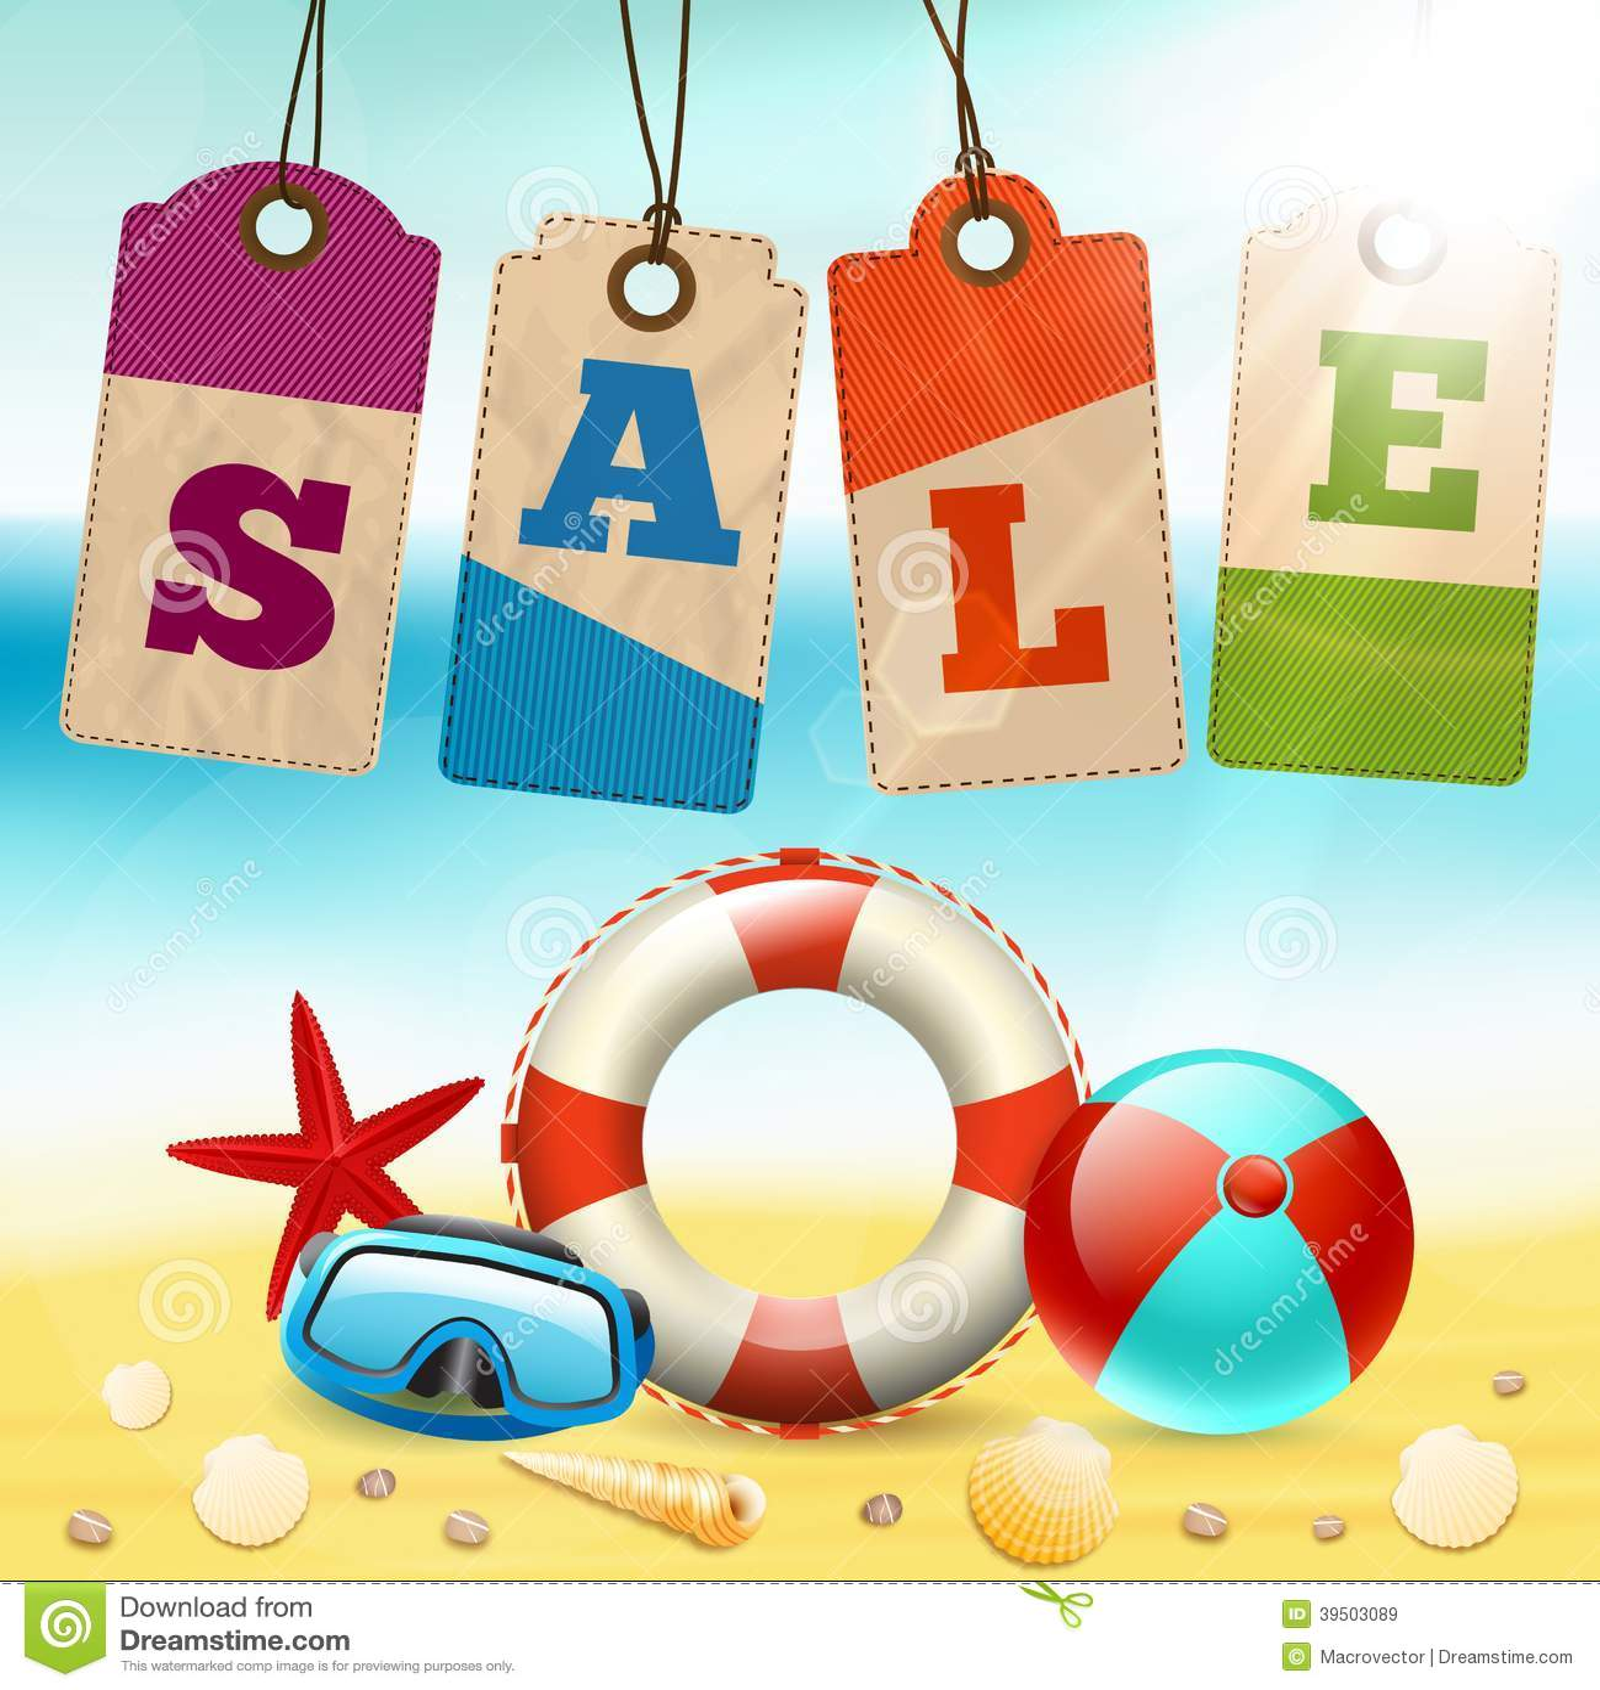 Summer holidays life saver ball sea shells with cardboard sale tags ...